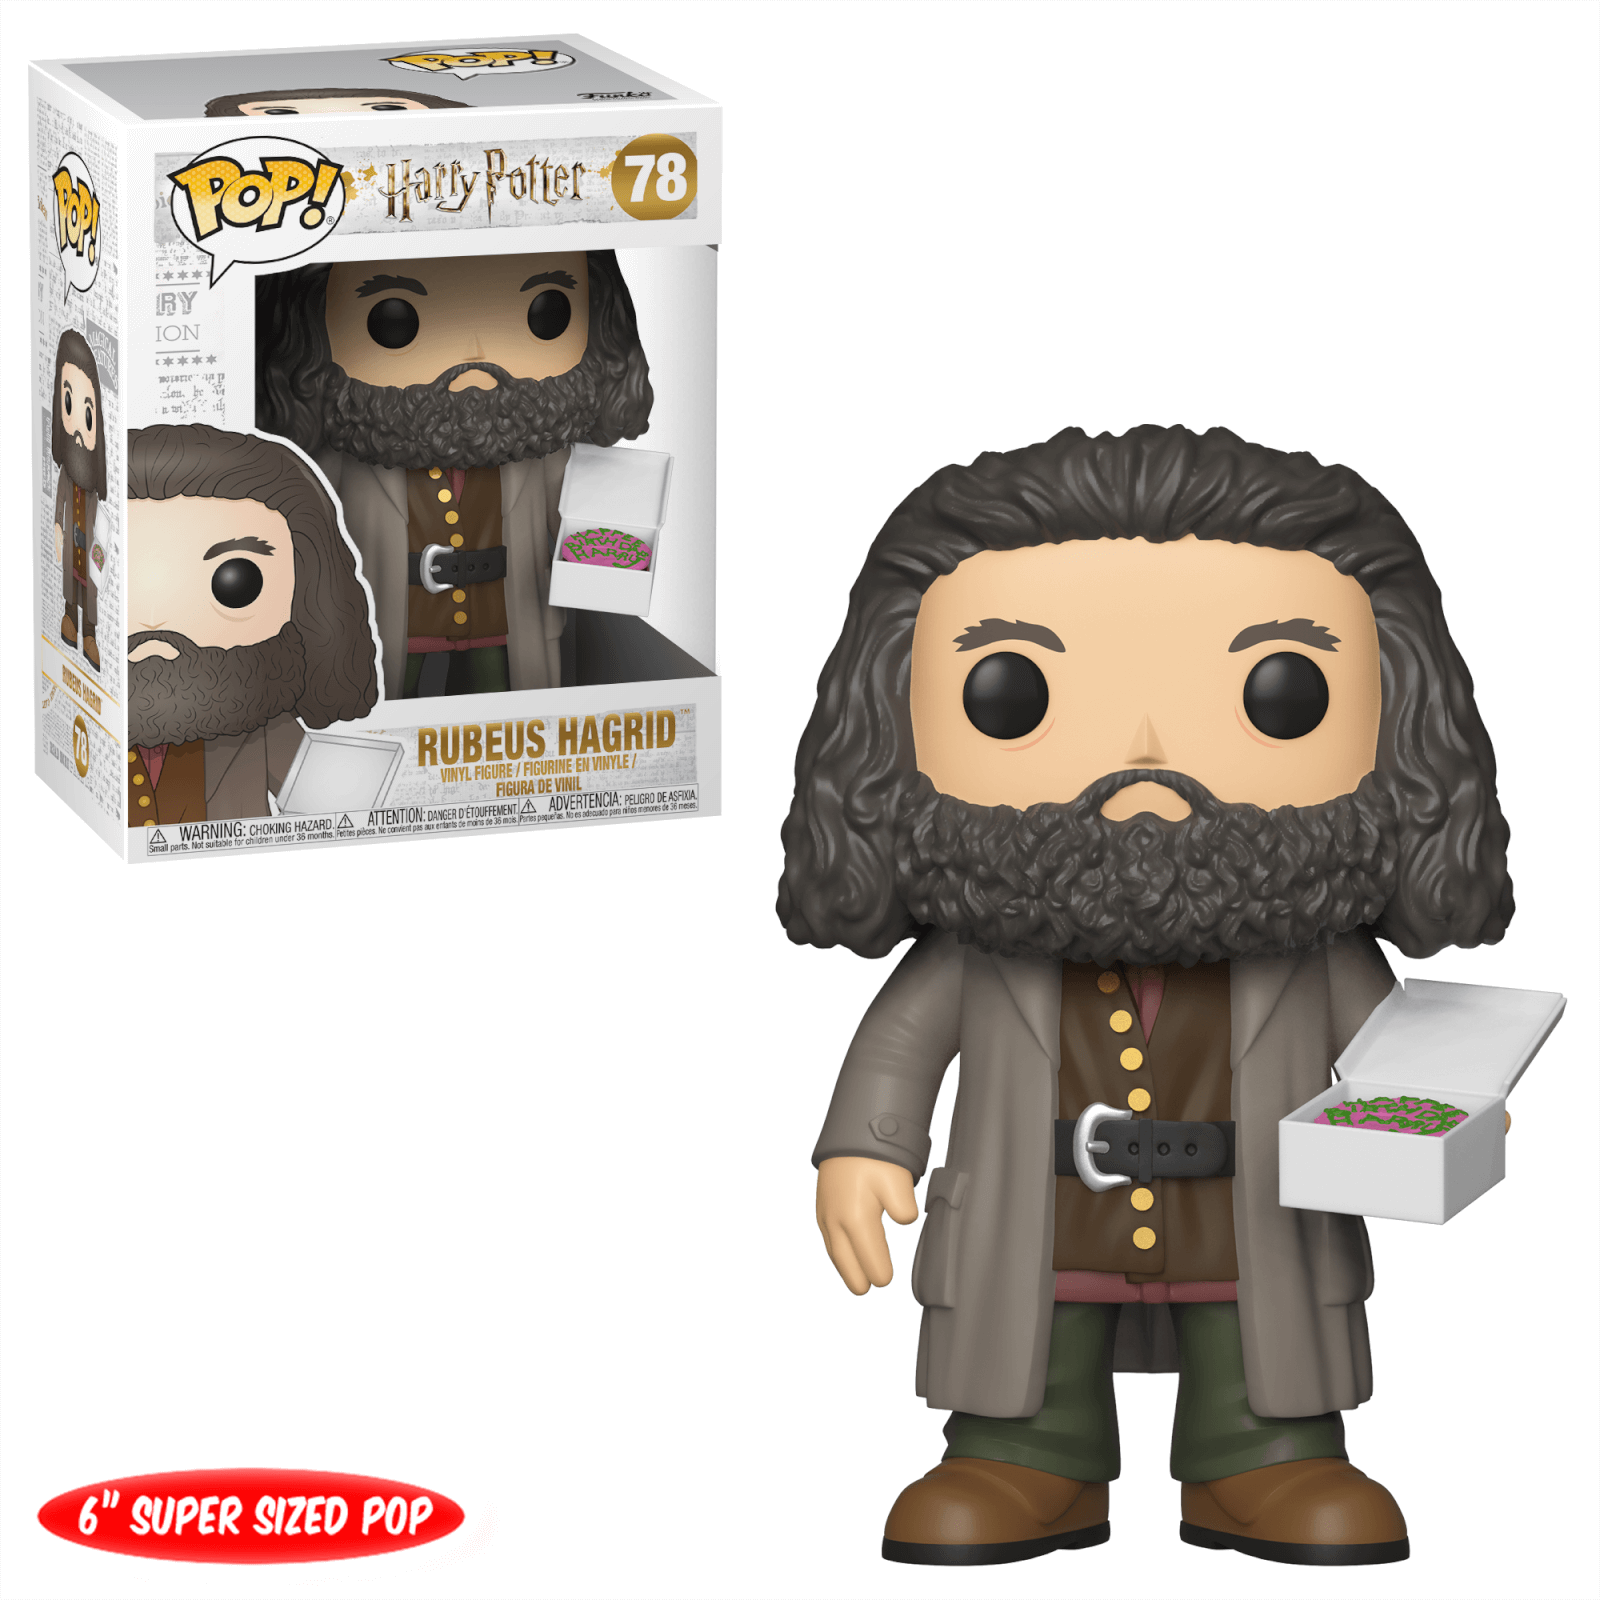 POP! Harry Potter: Rubeus Hagrid with Cake (Super Sized)